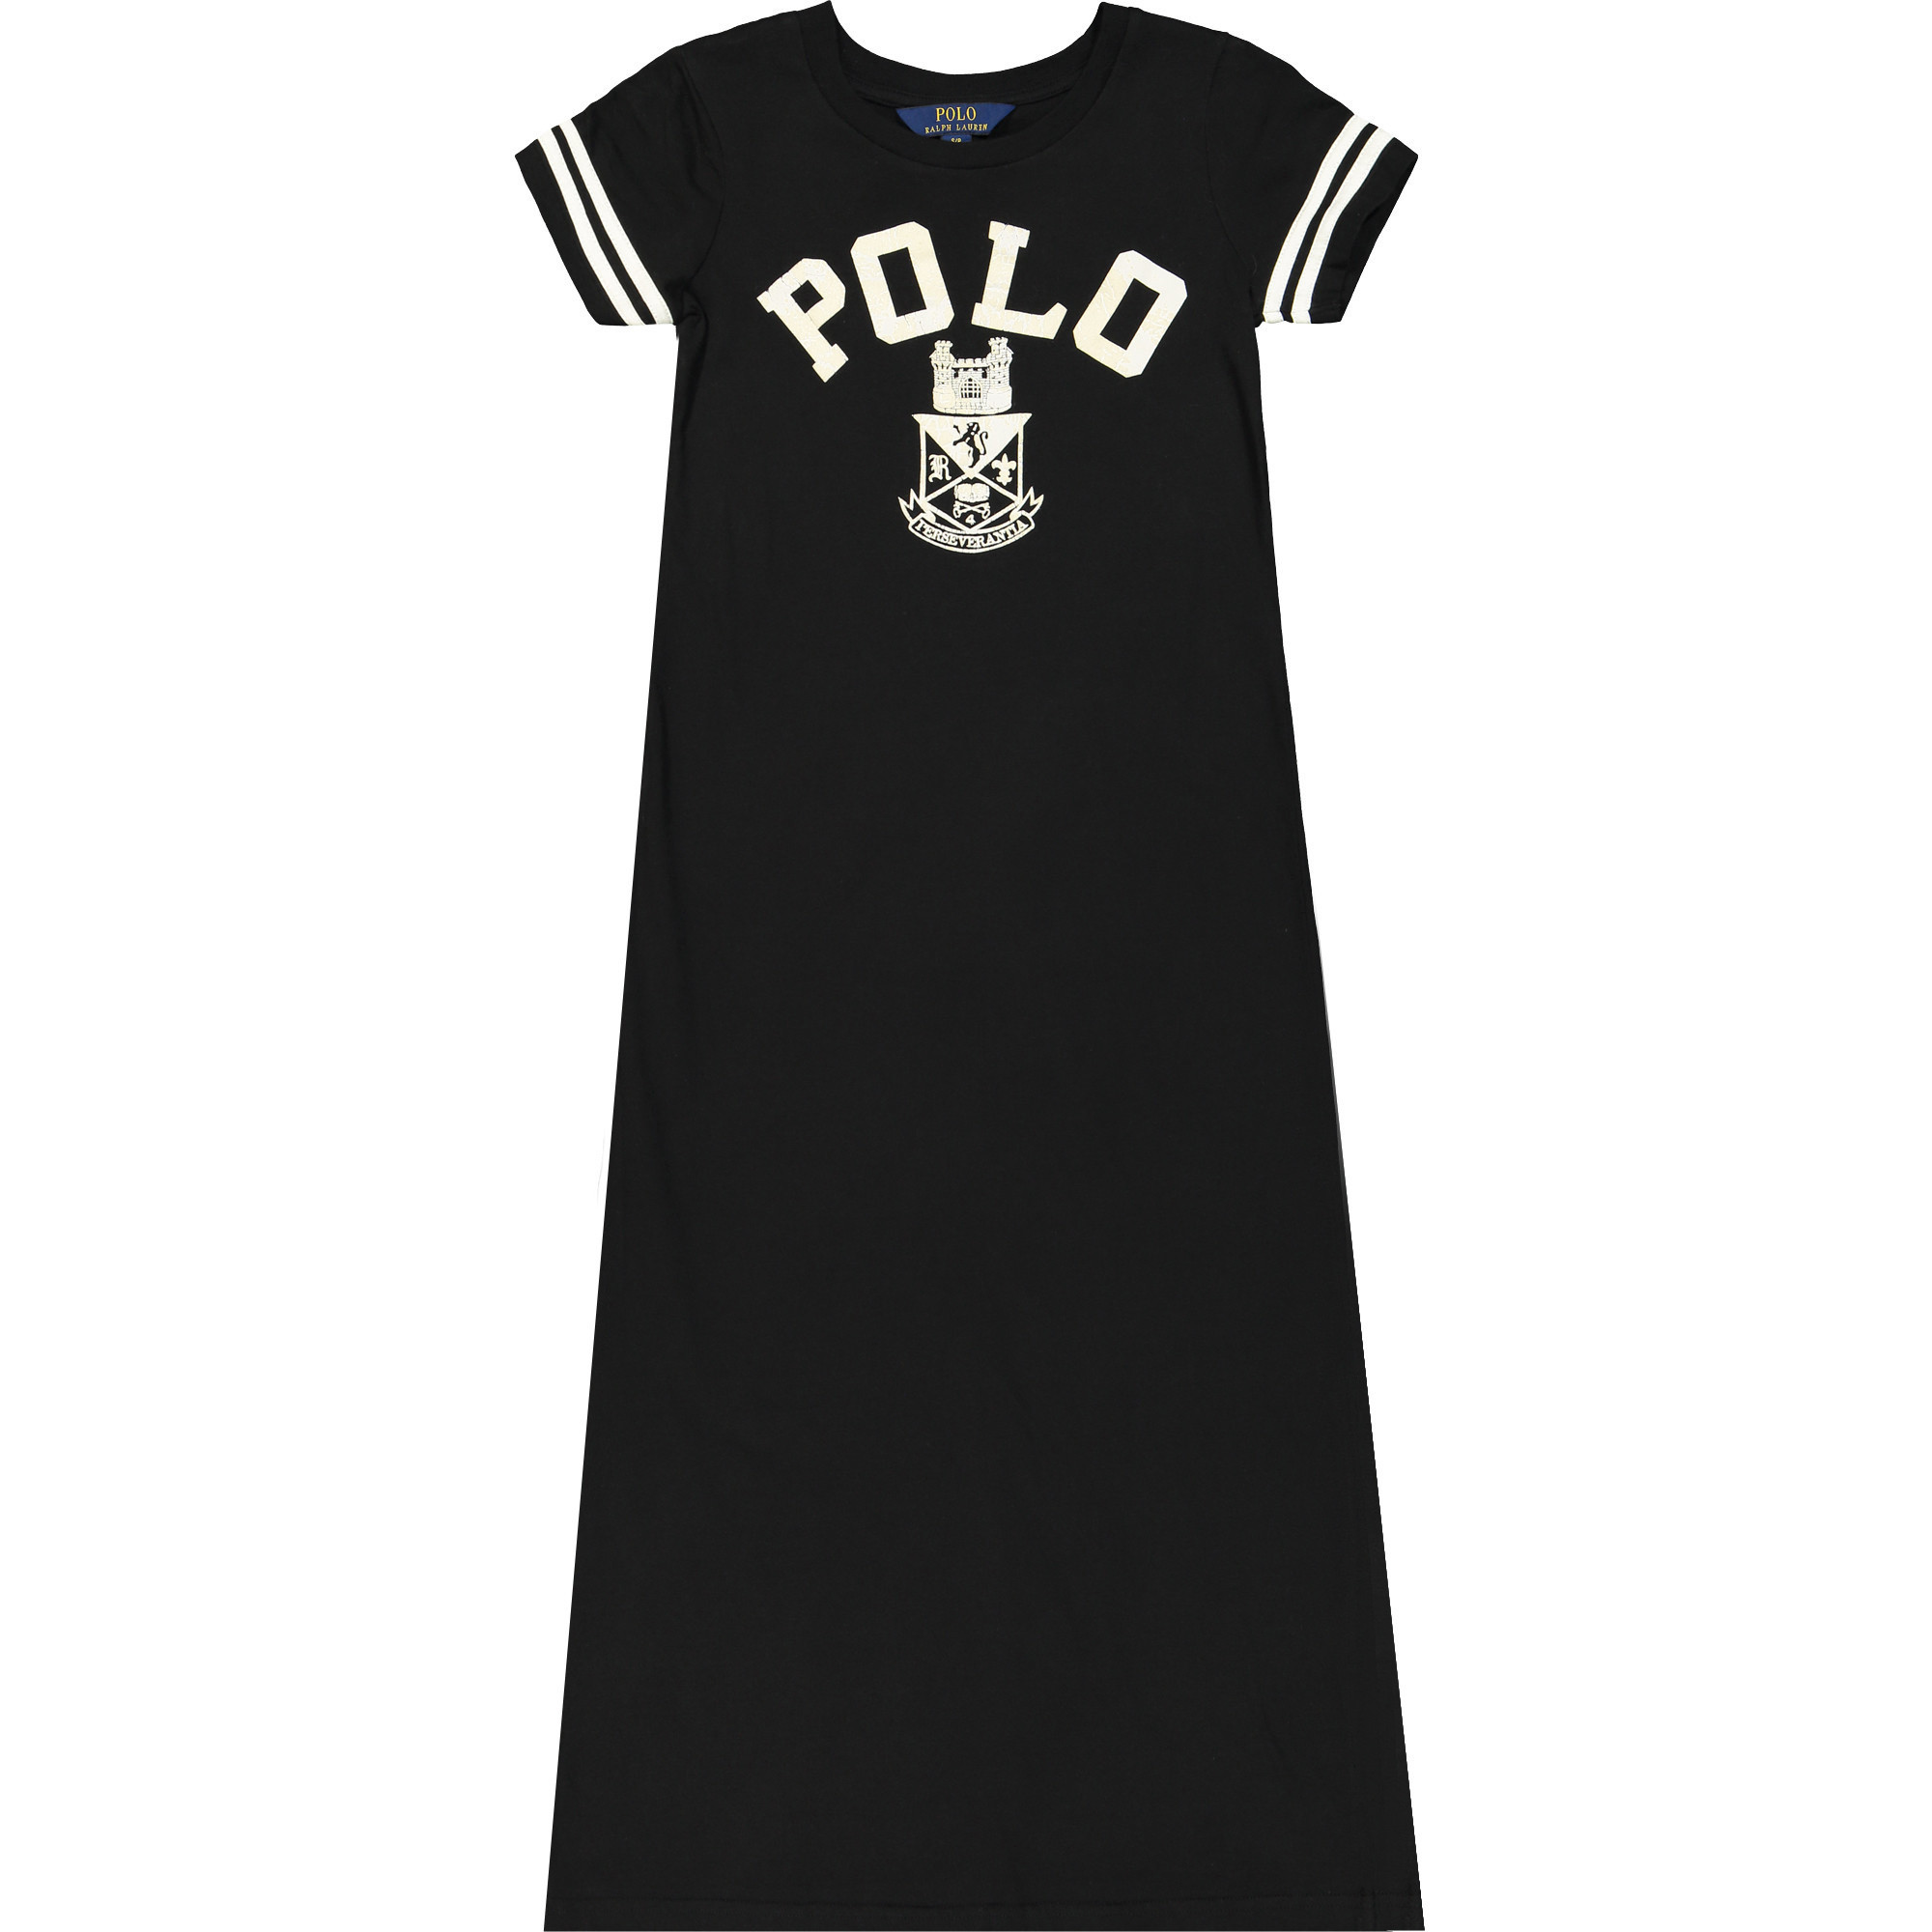 Polo Ralph Lauren Girls Black T-Shirt Maxi Dress — BAMBINIFASHION.COM